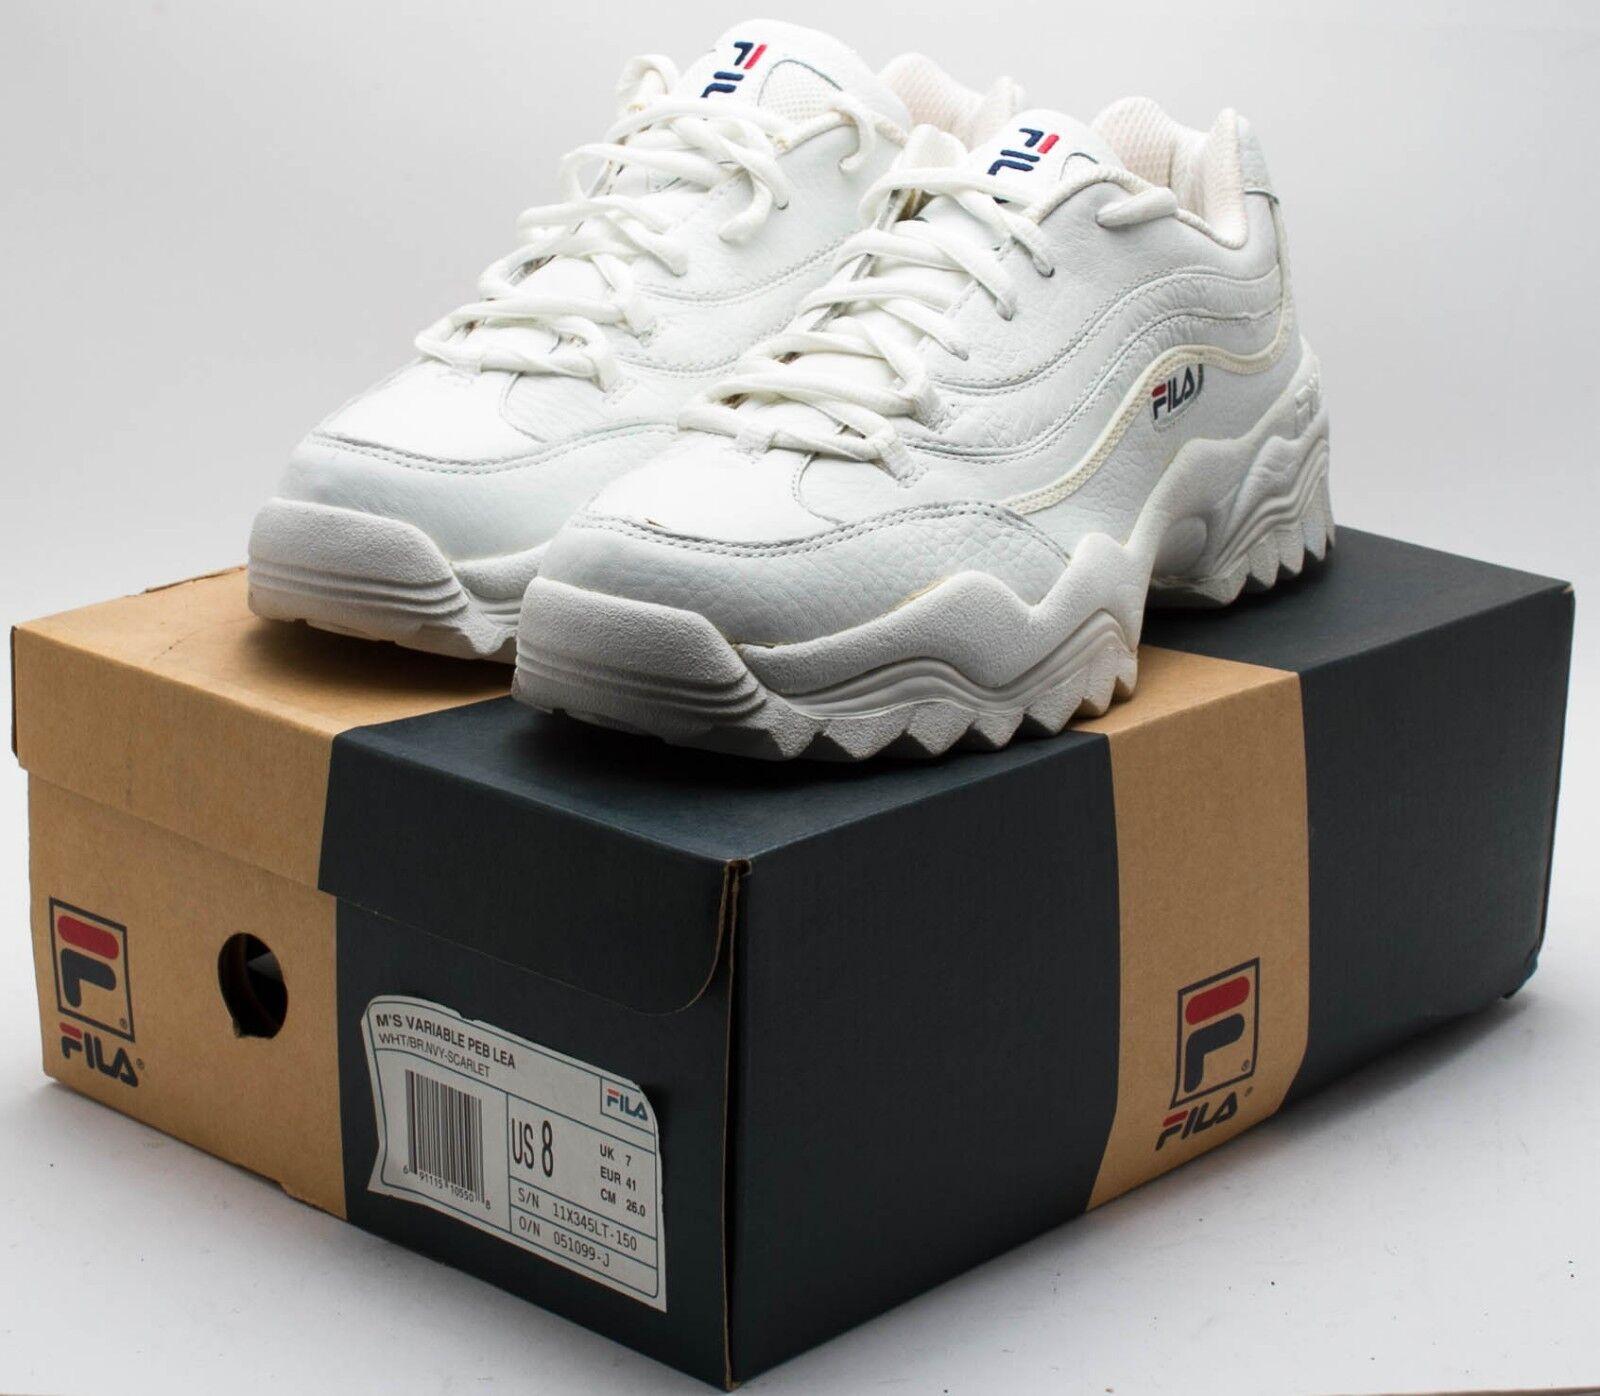 Scarpe casual da uomo Fila Vintage 1990s Variable Peb Lea shoes 11X345LT-150 White sz. 8